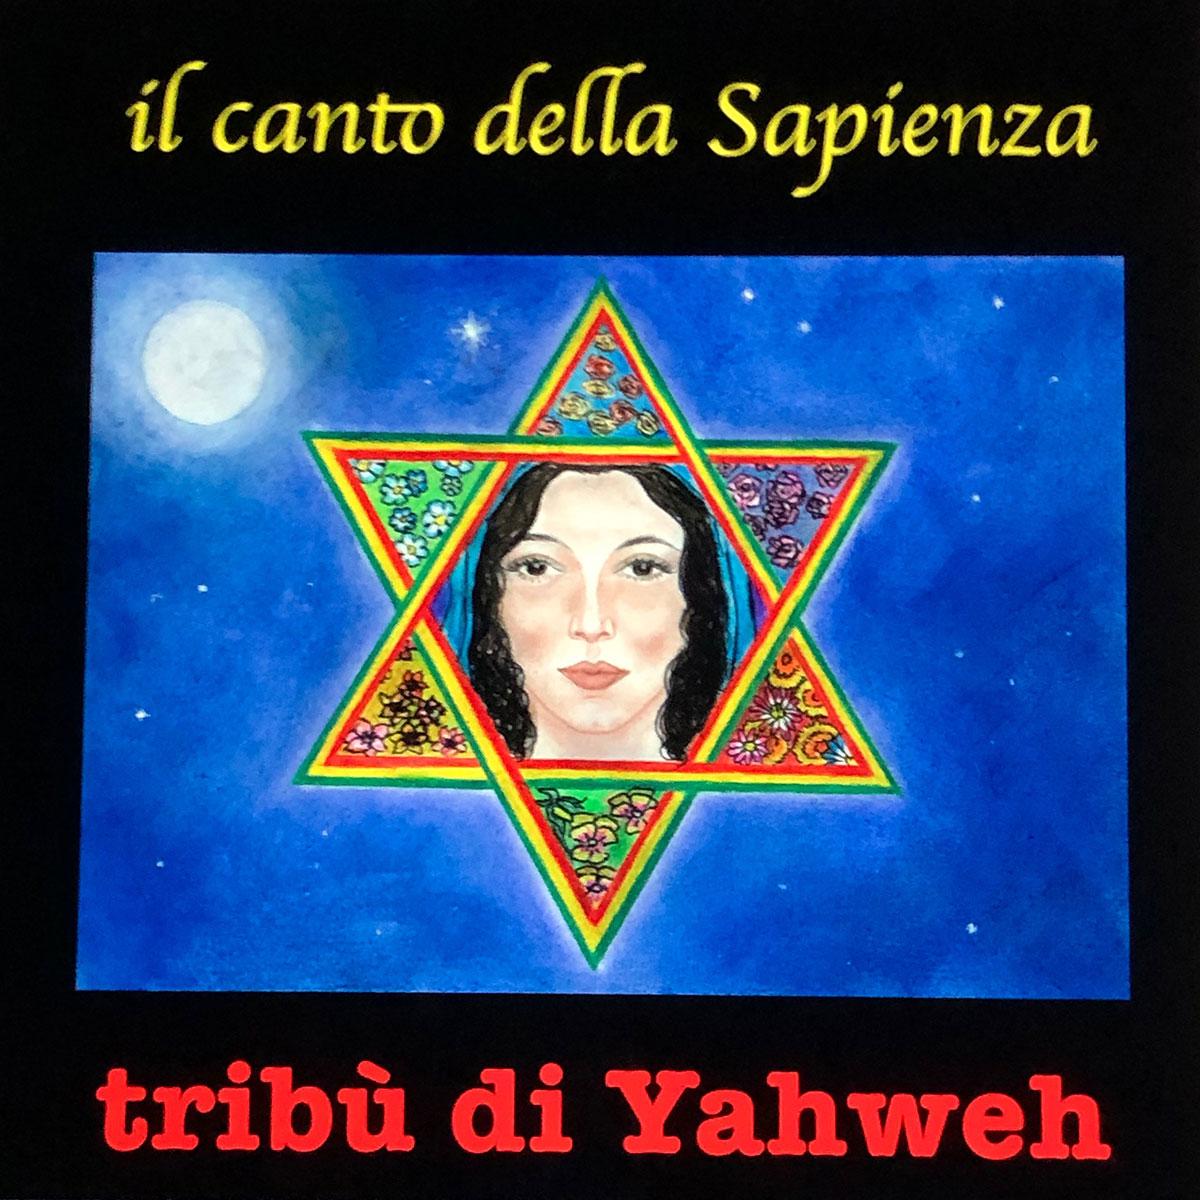 https://www.tribudiyahweh.com/wp/wp-content/uploads/2019/02/il-canto-della-sapienza.jpg